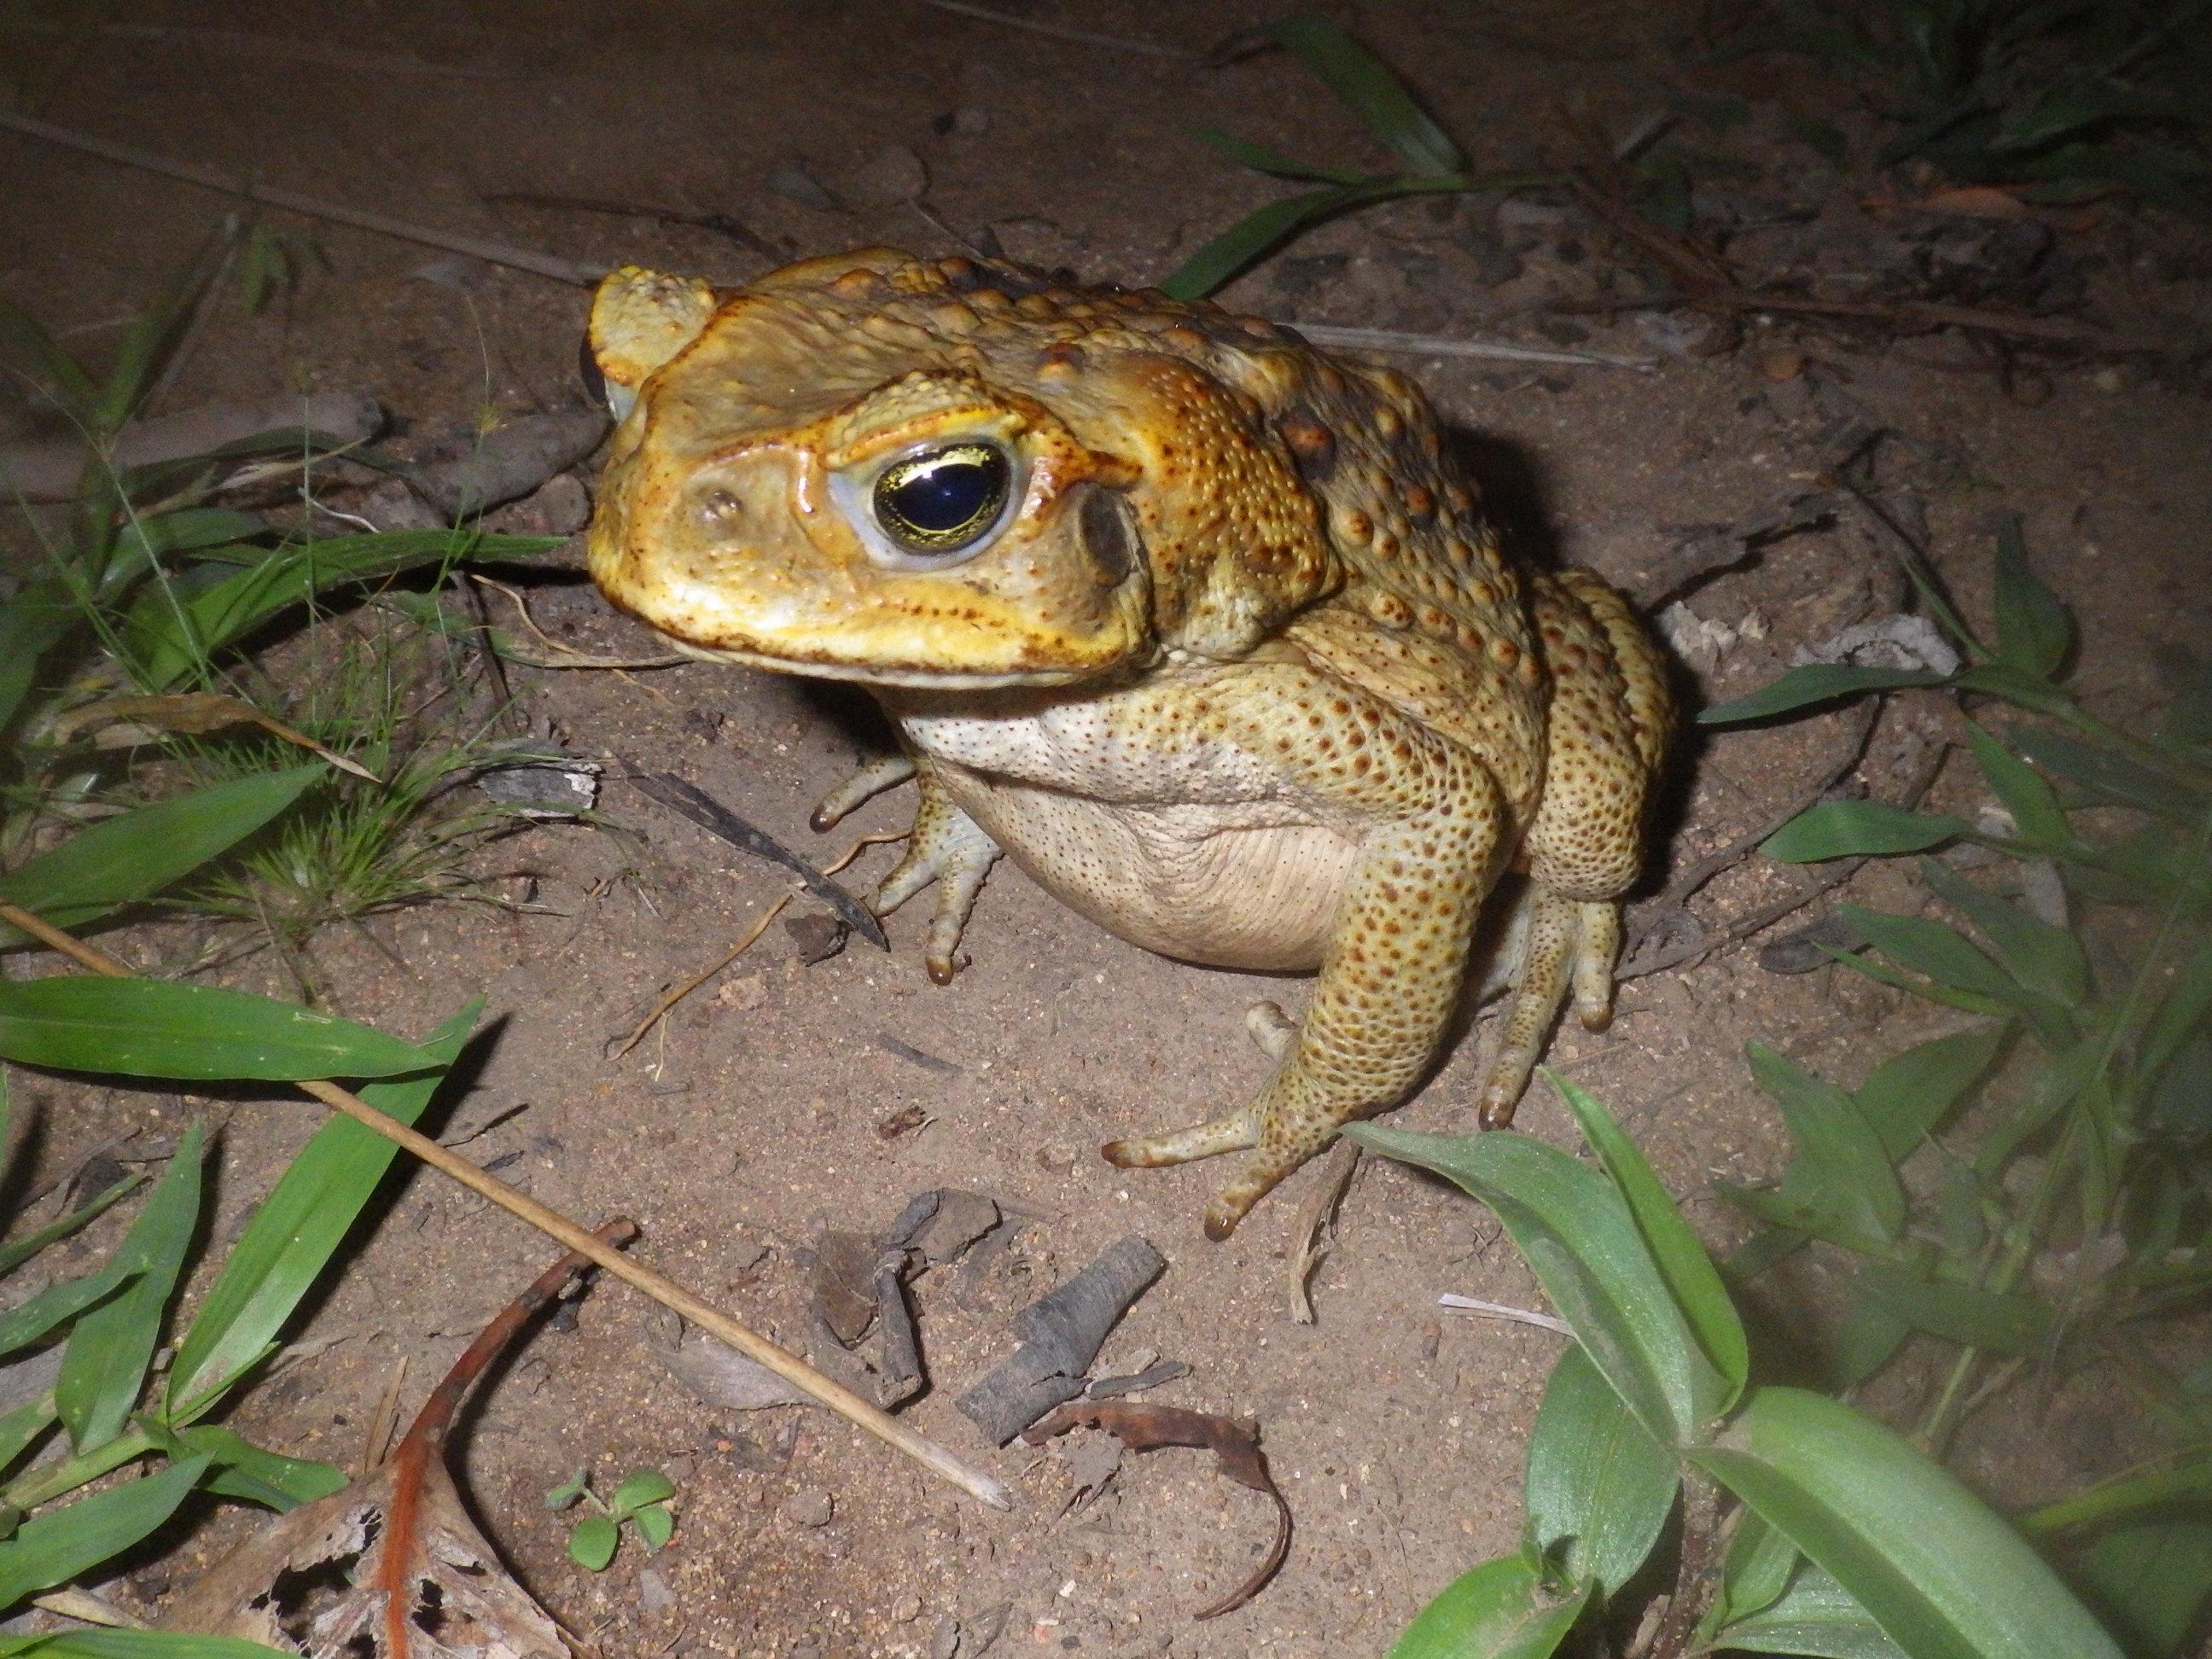 Cane Toad near Queensland, AU